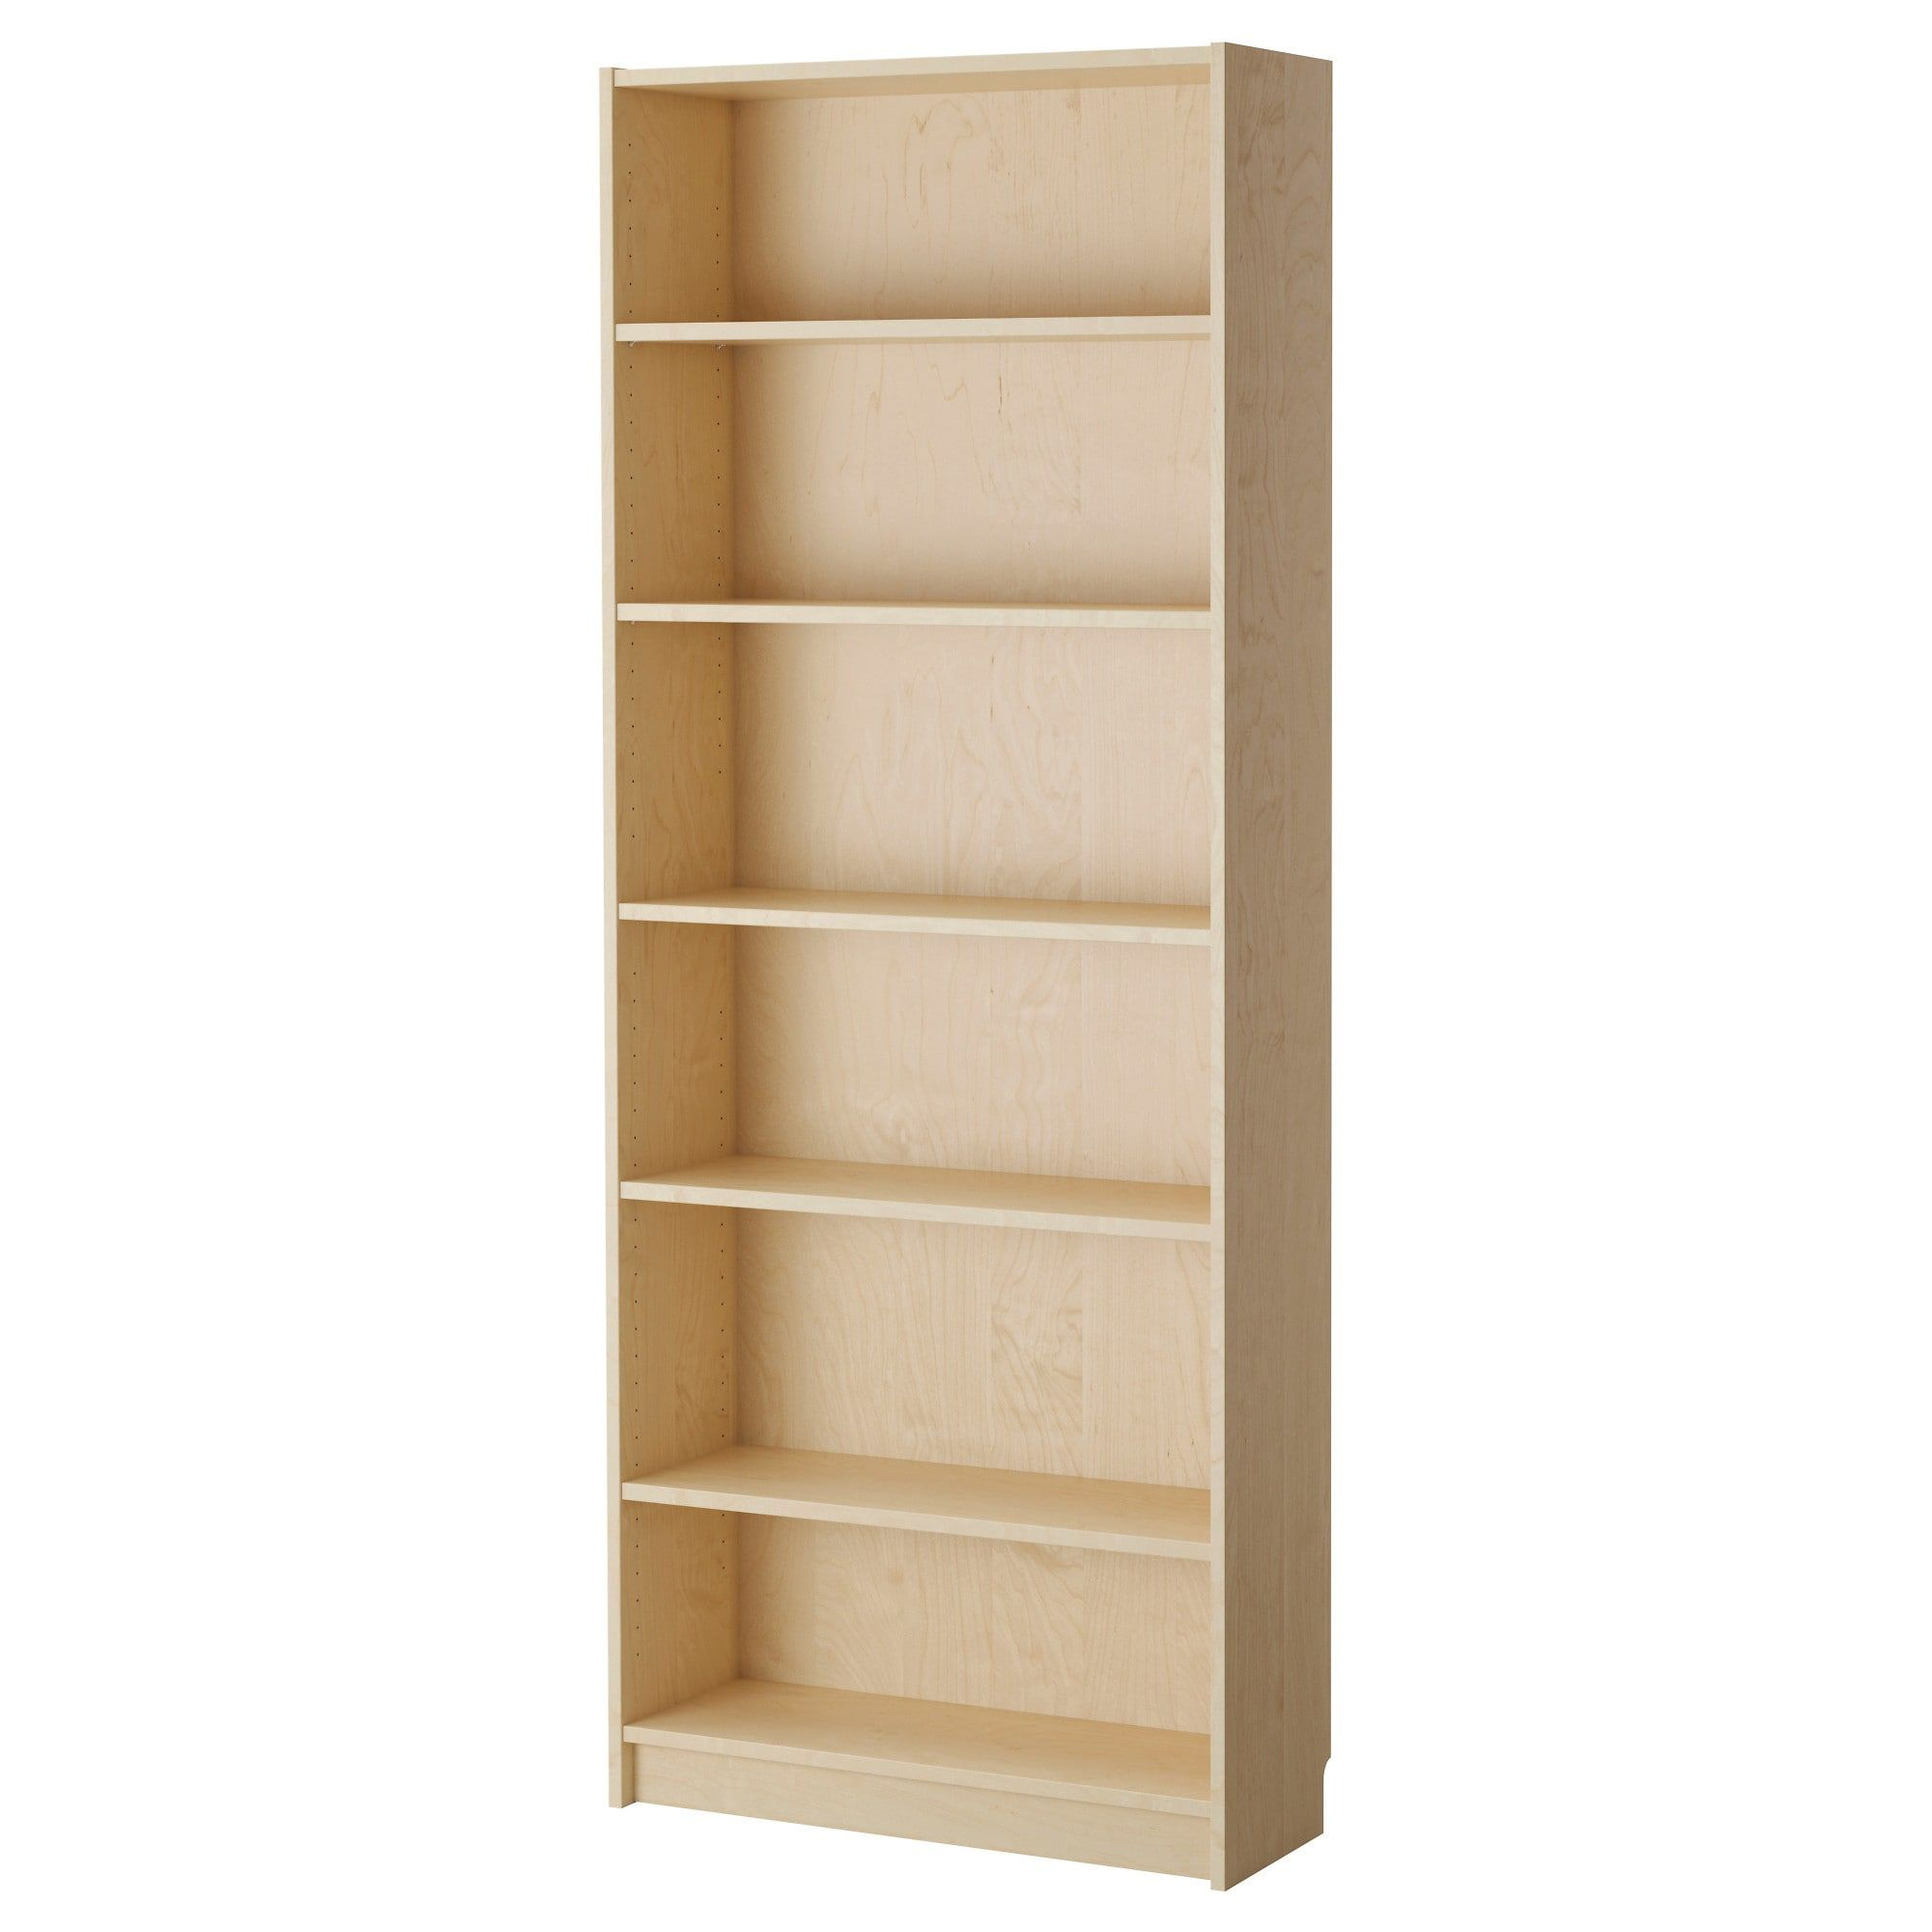 Ikea Billy White Bookcase Shoe Storage Furniture Shoe Storage Apartment Shoe Storage